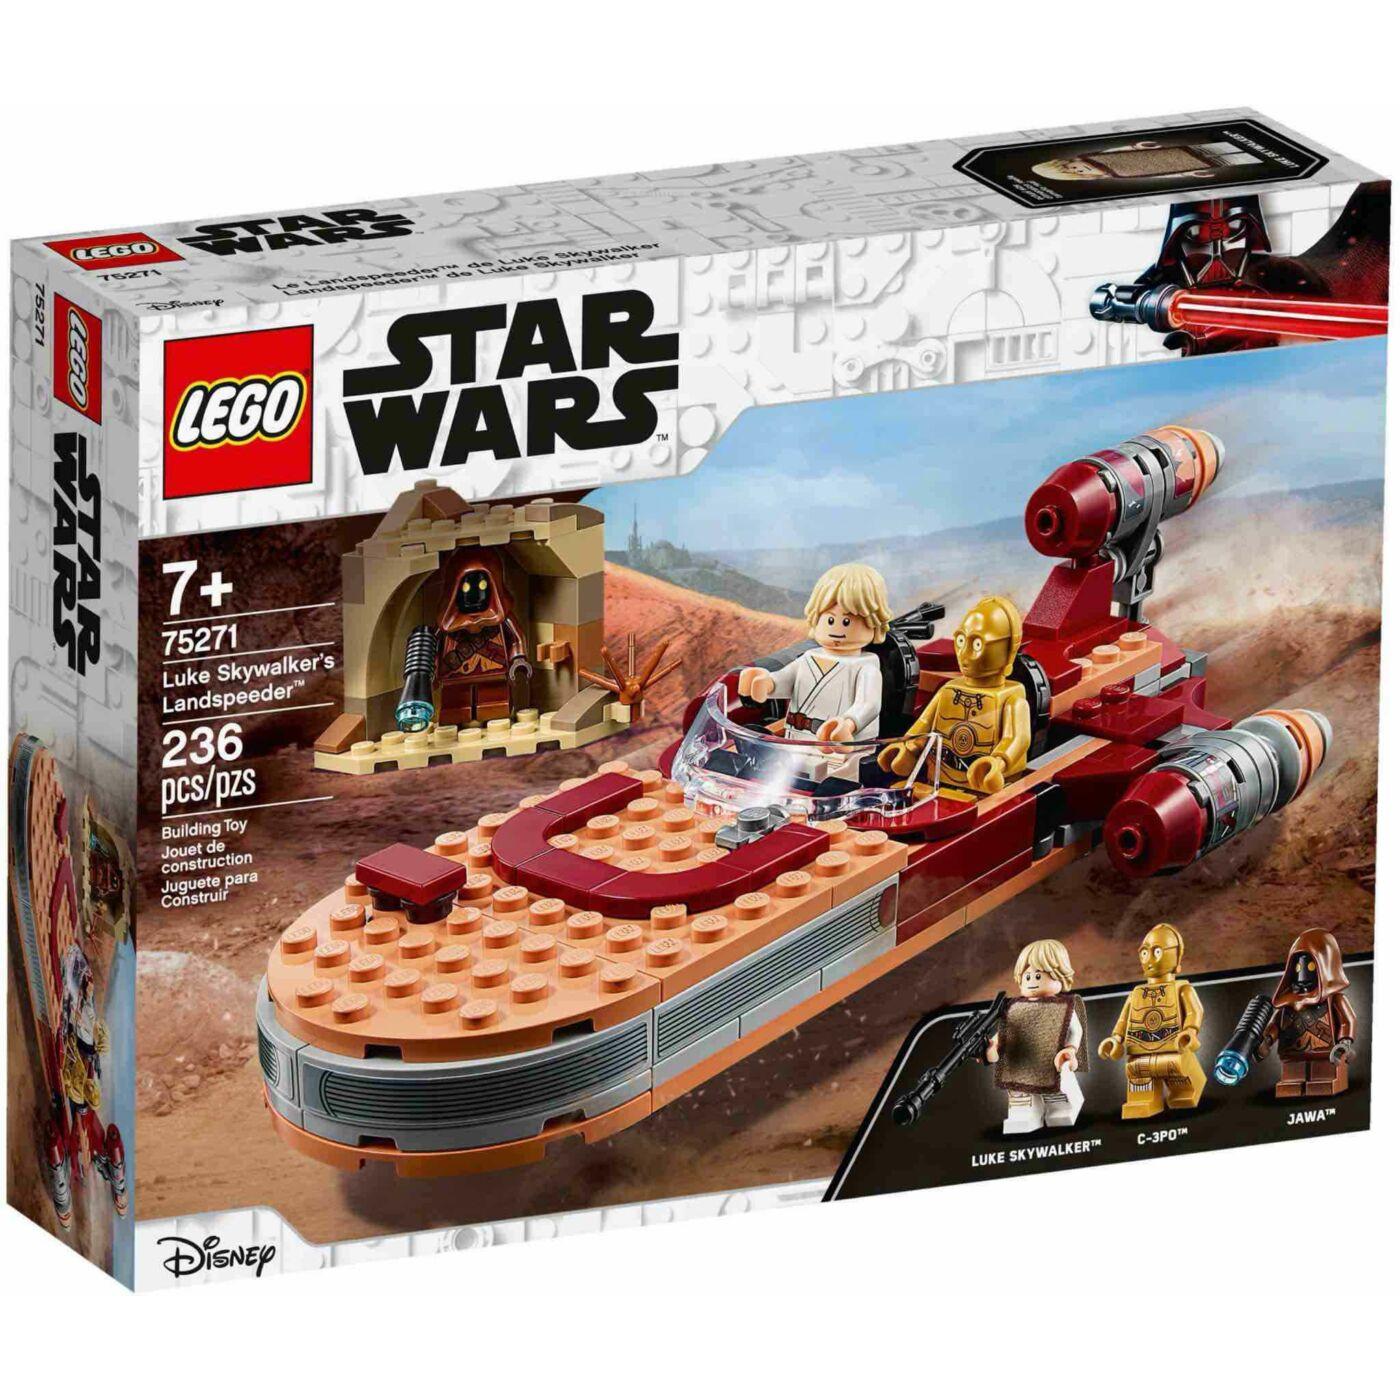 Lego Star Wars Luke Skywalker landspeedere